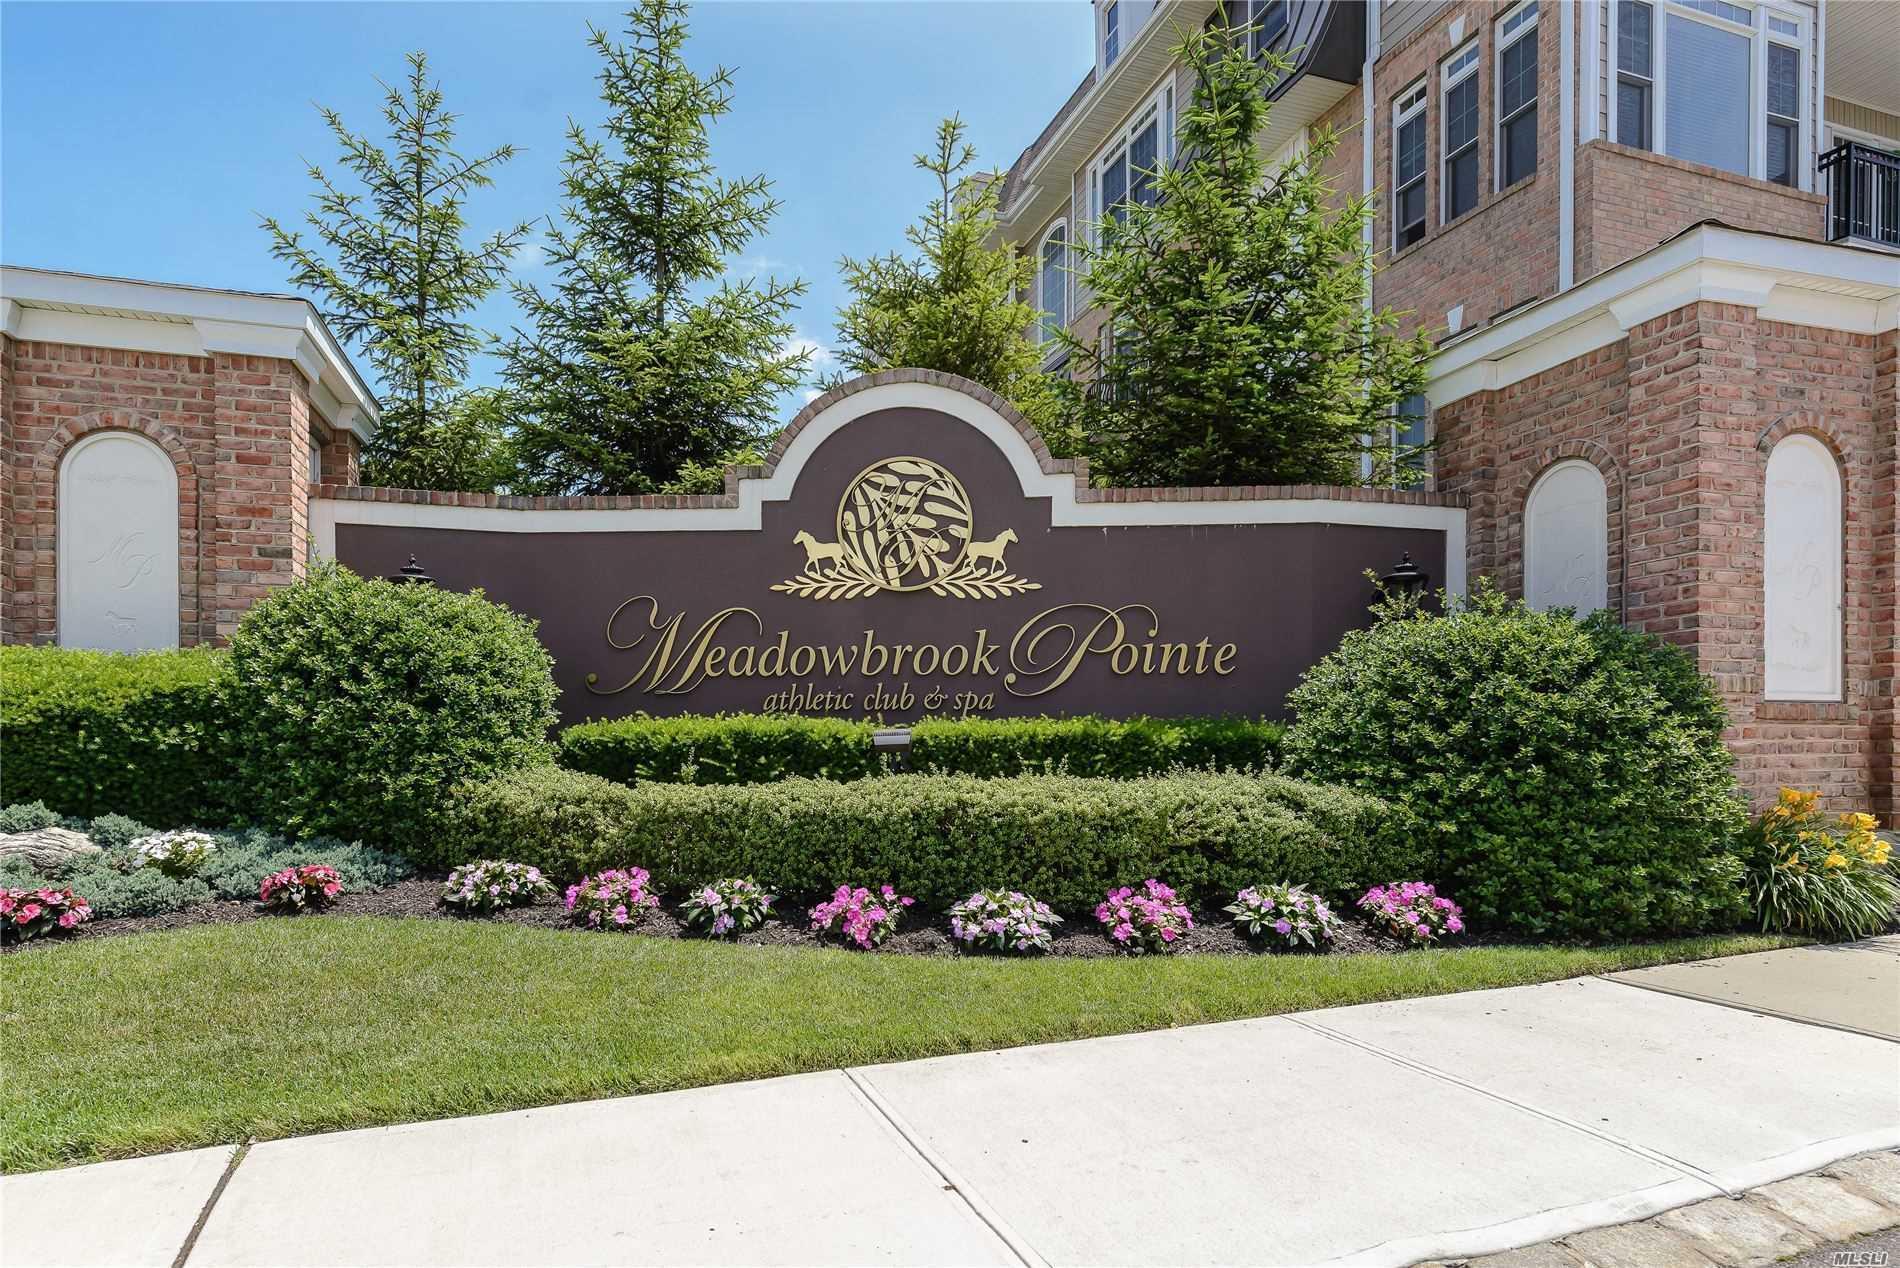 Property for sale at 558 Roosevelt Way N # 558, Westbury NY 11590, Westbury,  New York 11590